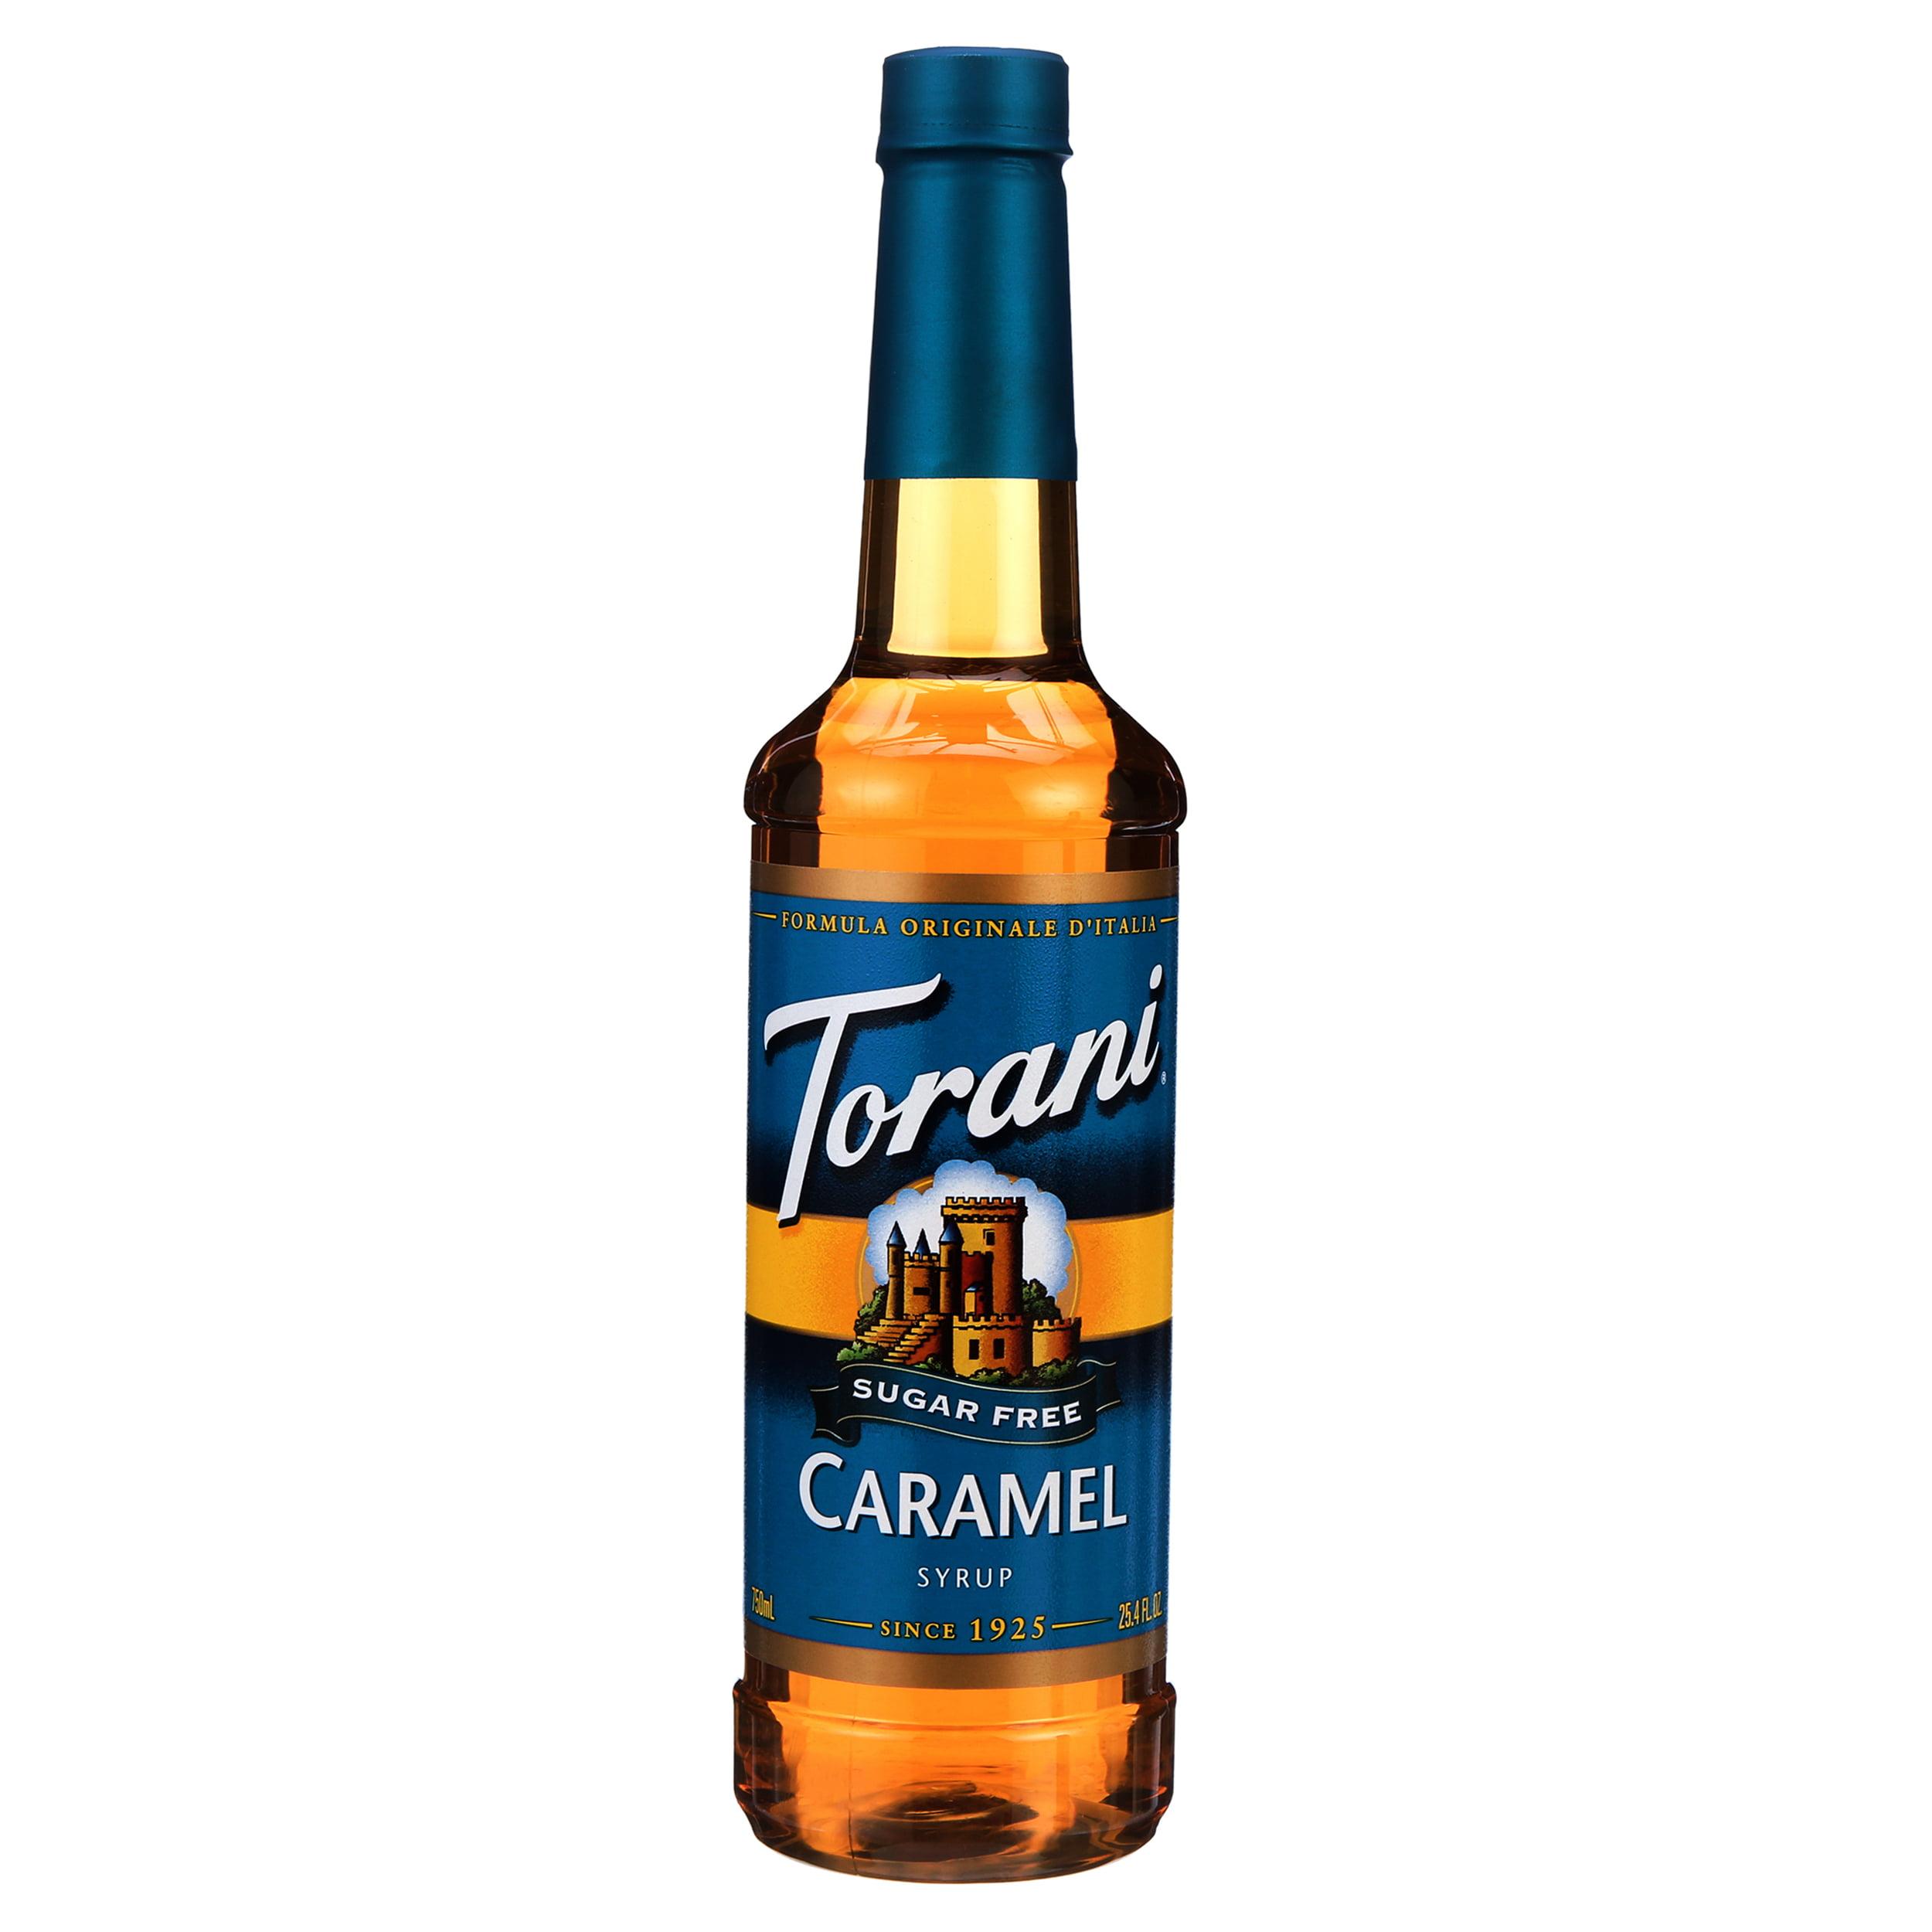 Torani Sugar Free Caramel Syrup, Coffee Flavoring, Drink ...